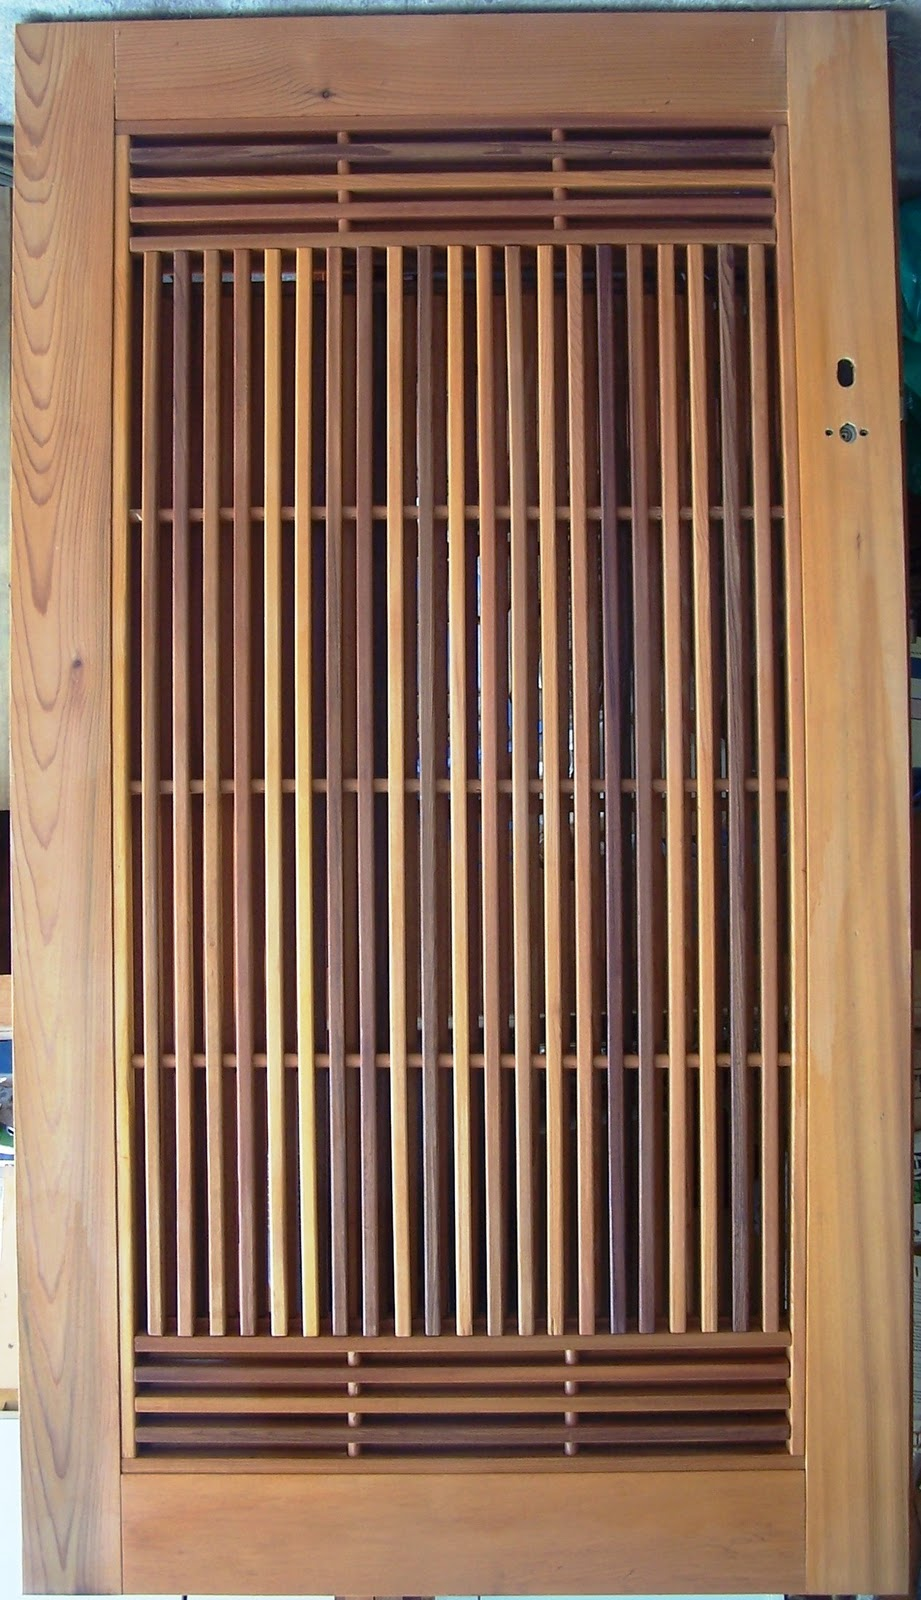 Astonishing Bamboo Grove Photo Bamboo Doors Door Handles Collection Olytizonderlifede